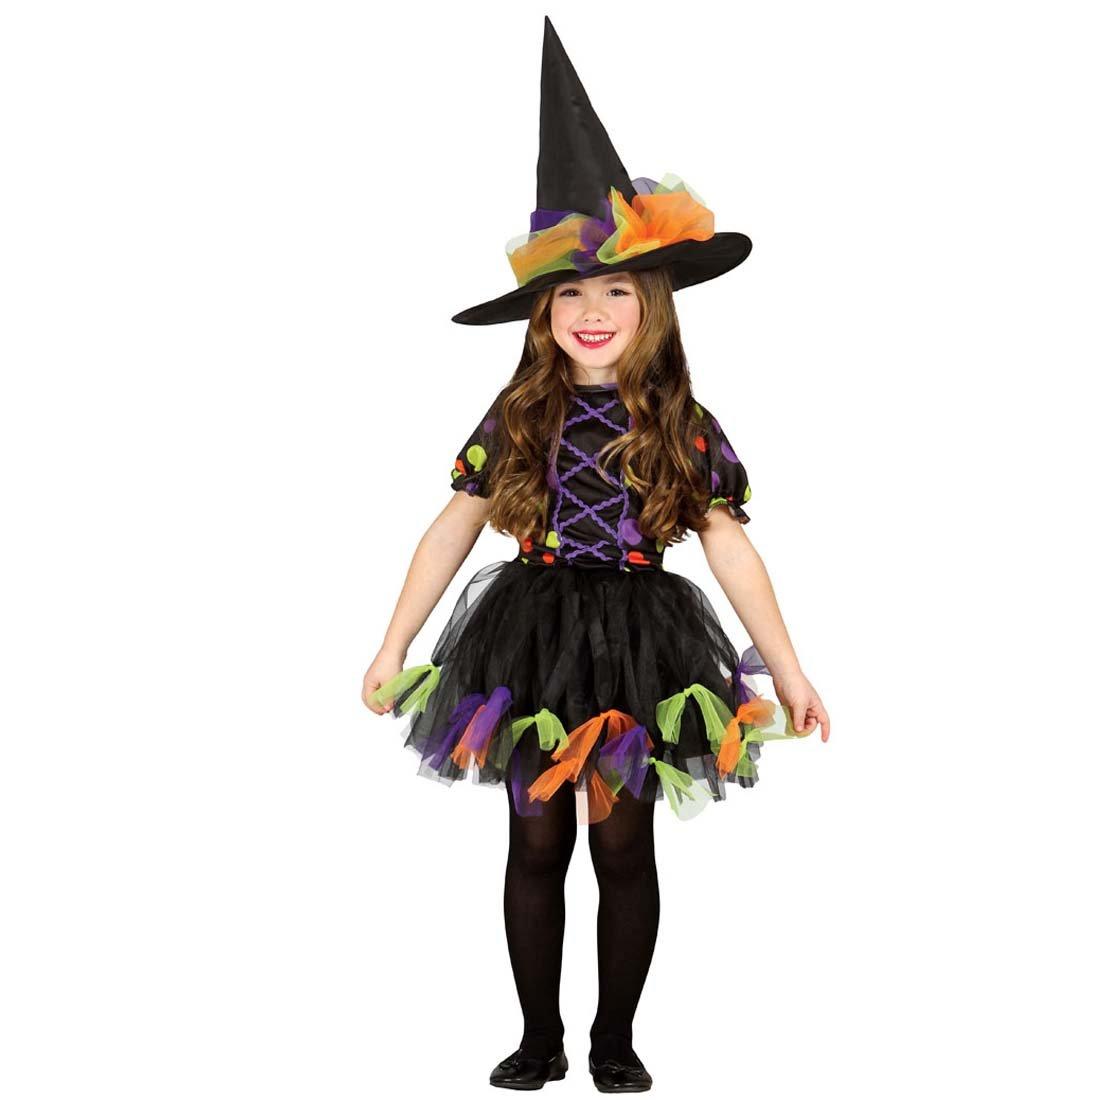 Kostüme Kinder Hexenkostüm Kostüm Hexe Zauberin Magierin Halloween 158cm L 11-13 Jahre